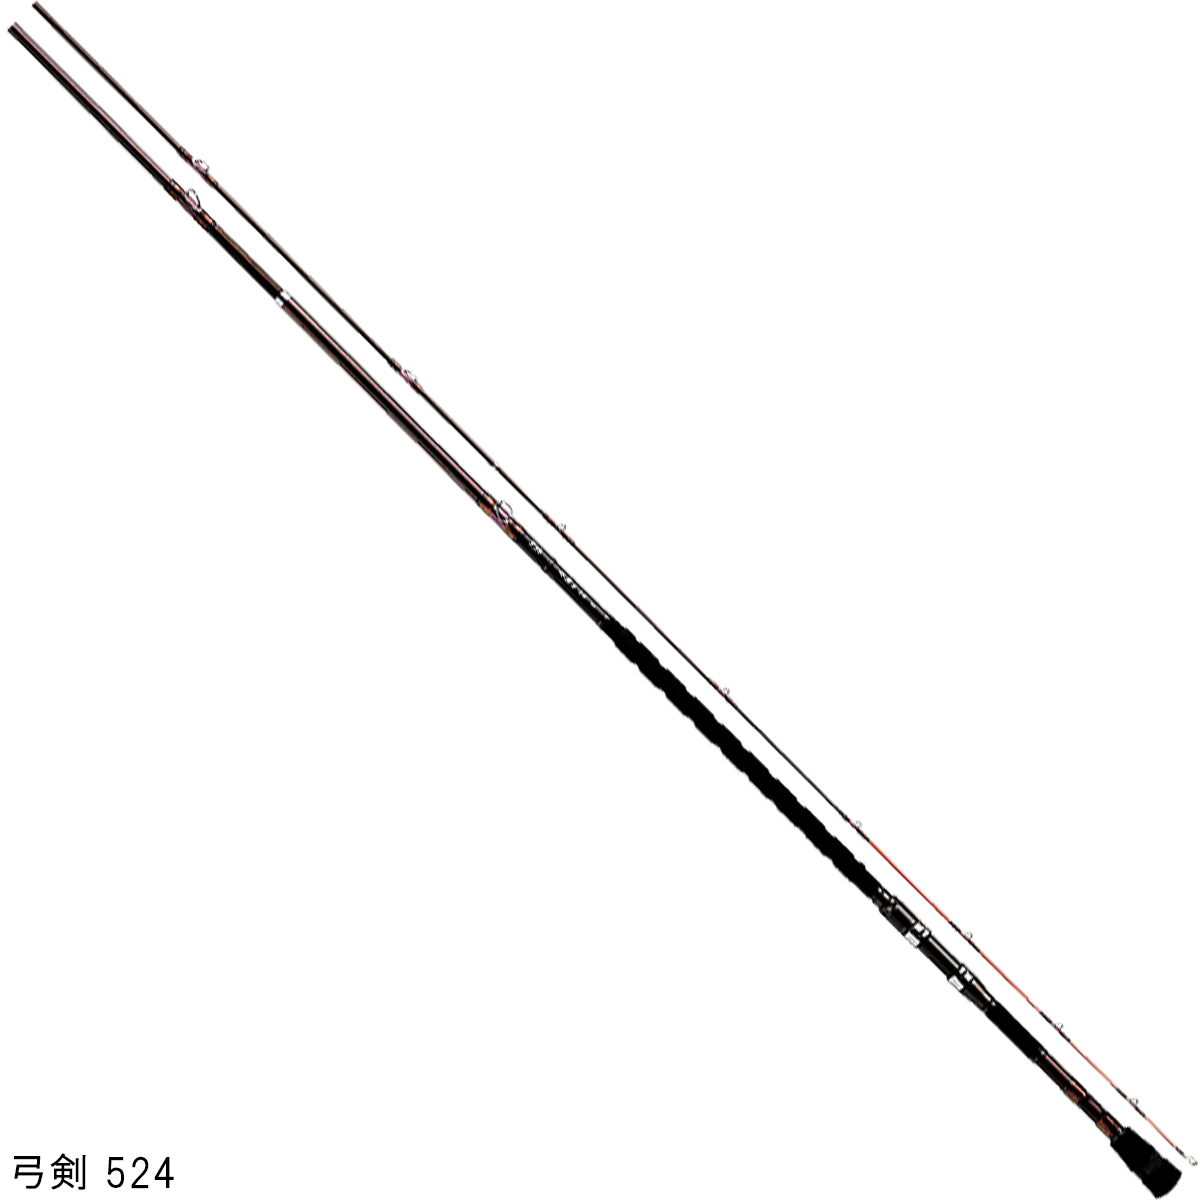 ダイワ 幻覇王 弓剣 524【大型商品】【送料無料】